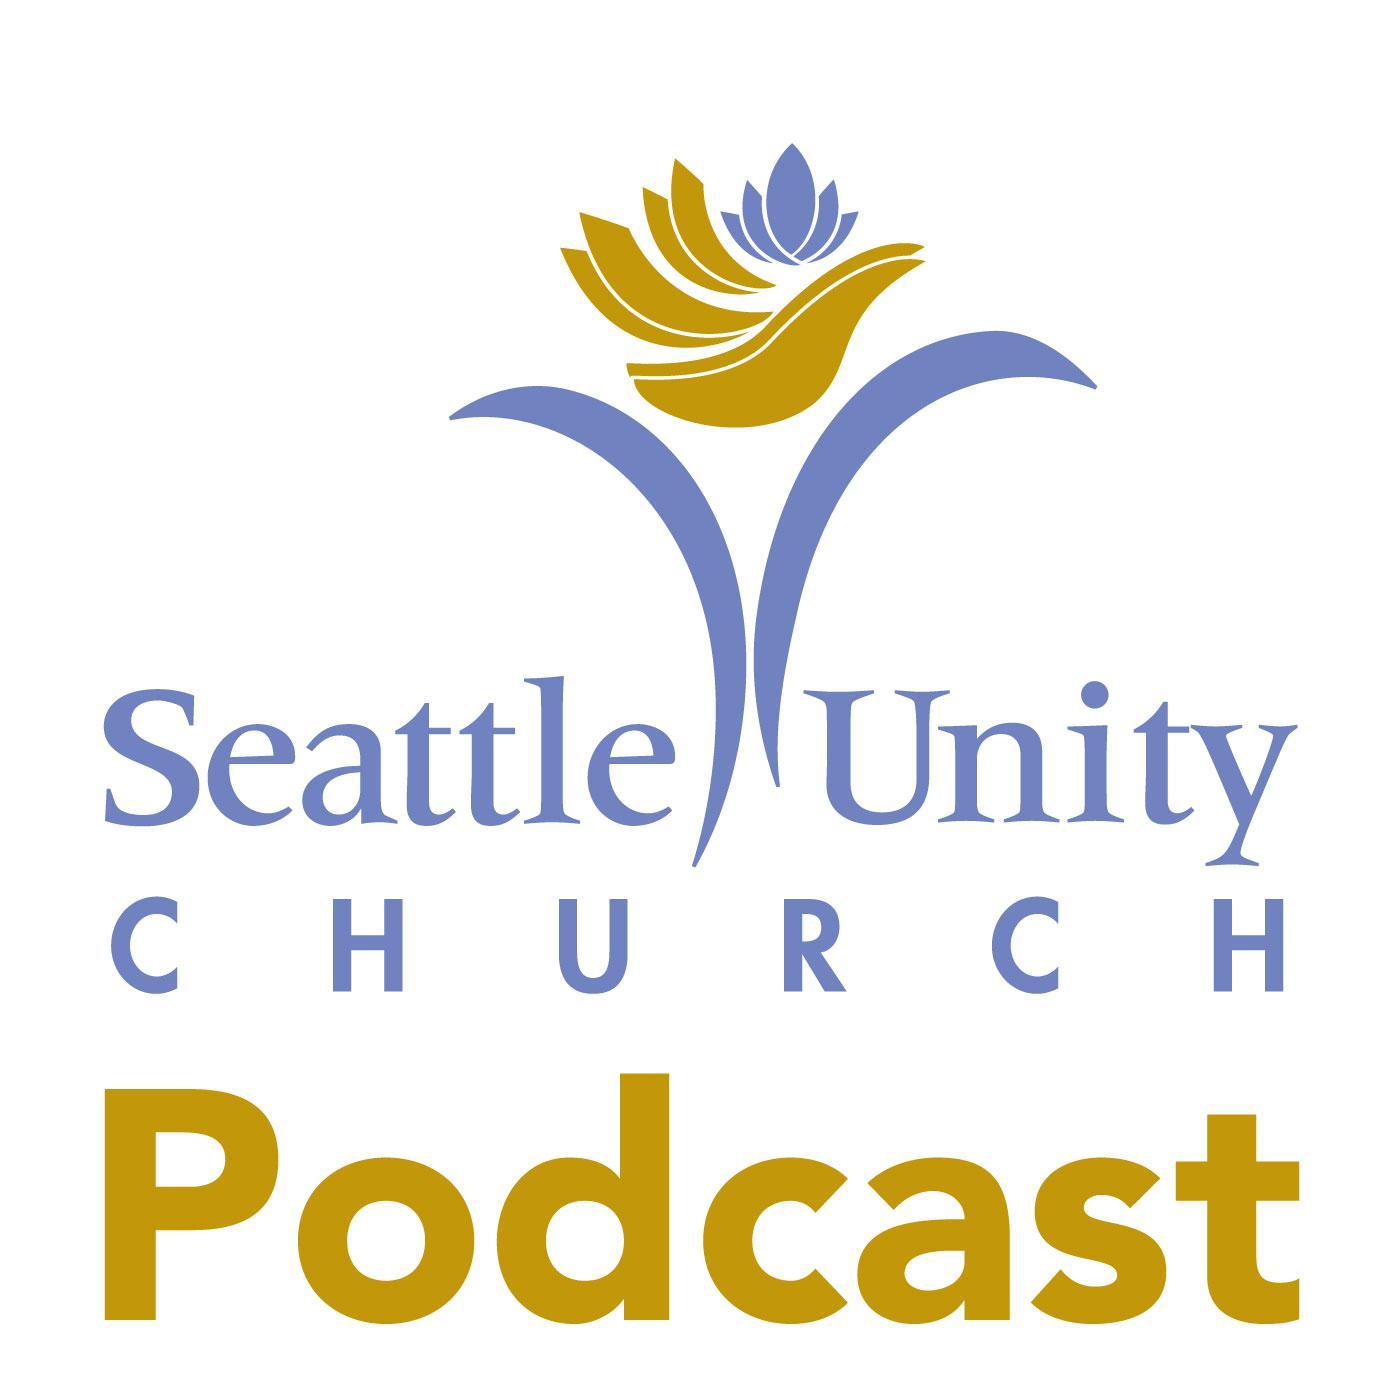 Seattle Unity Church (podcast) - Seattle Unity Church